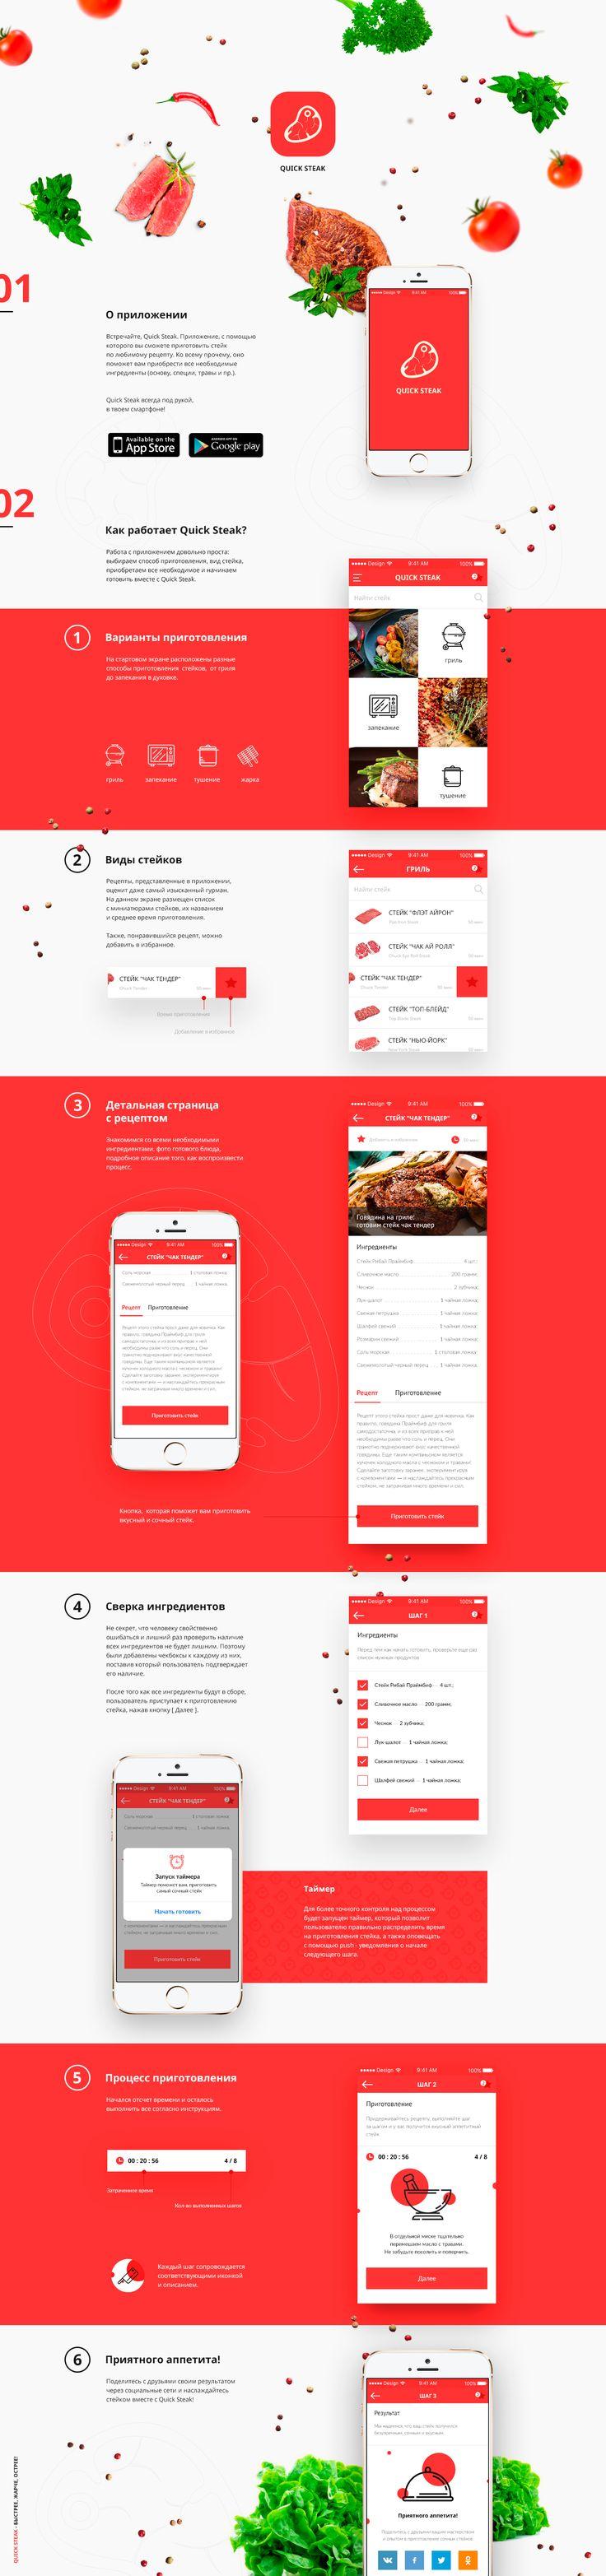 Quick Steak - App on Behance